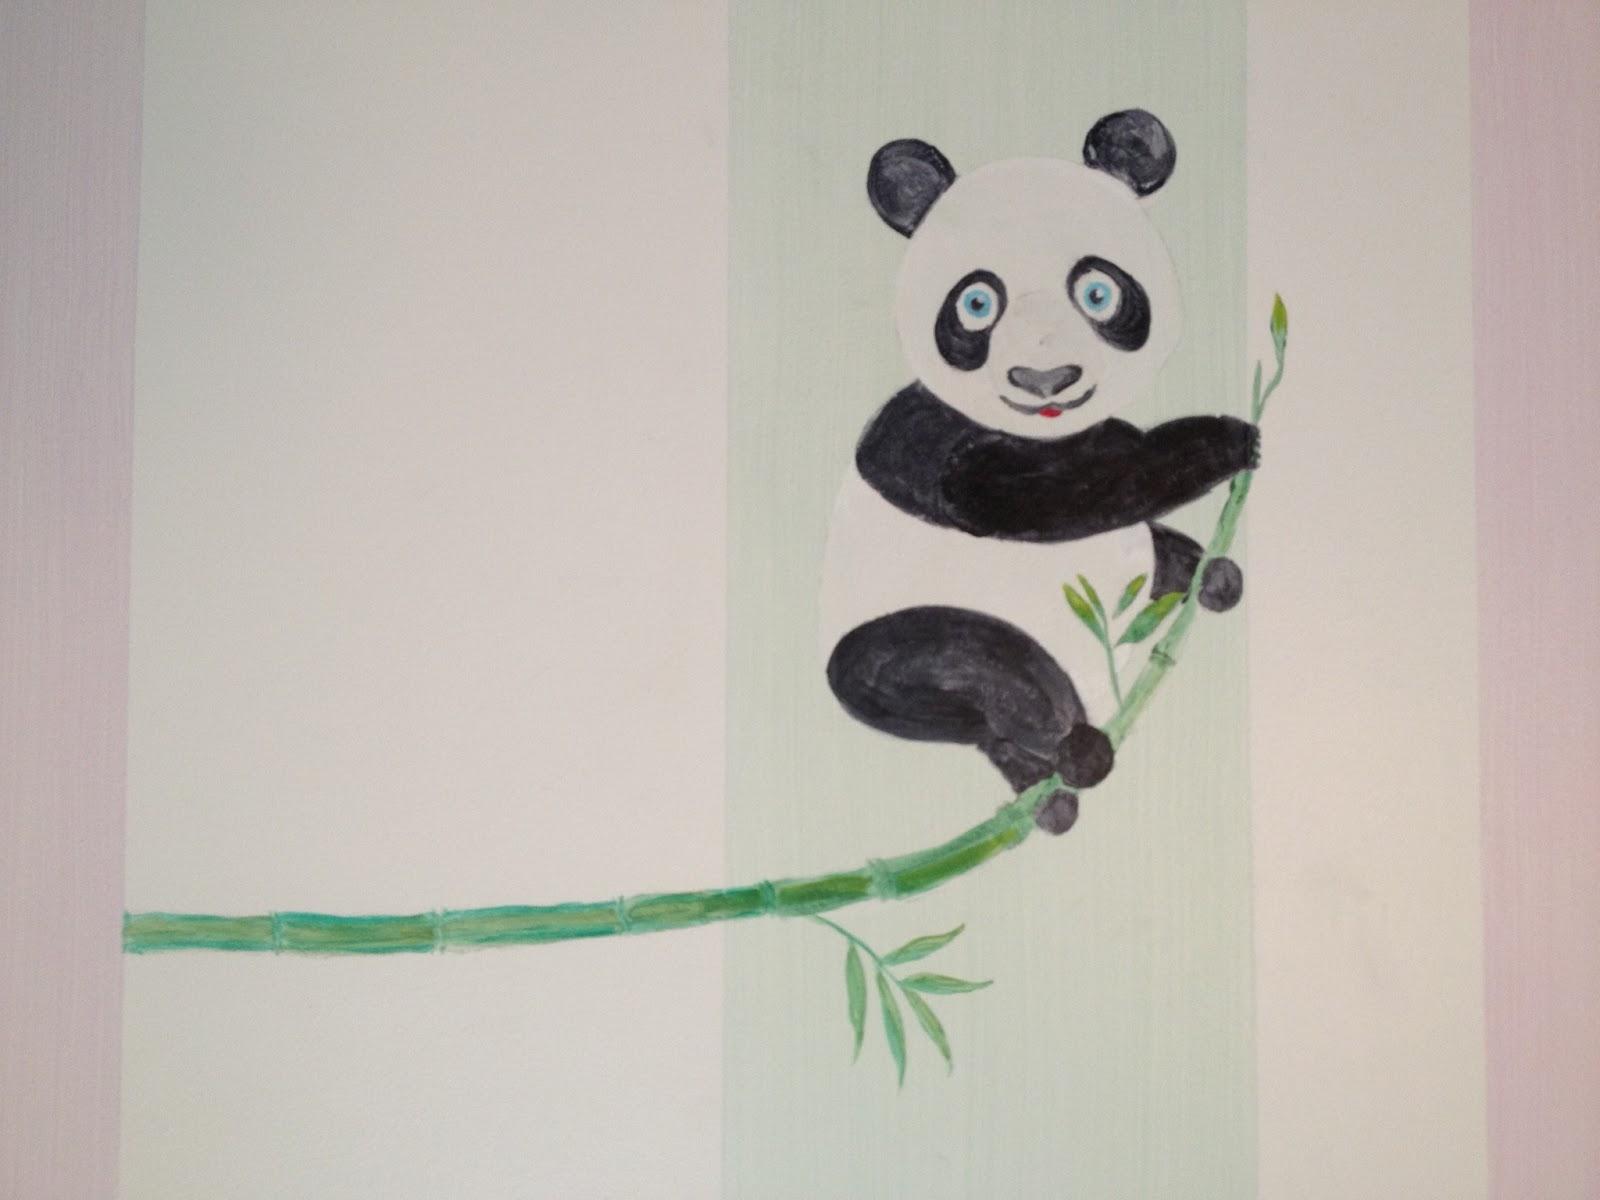 high definition wallpapercomphotopanda bear wallpaper border8html 1600x1200